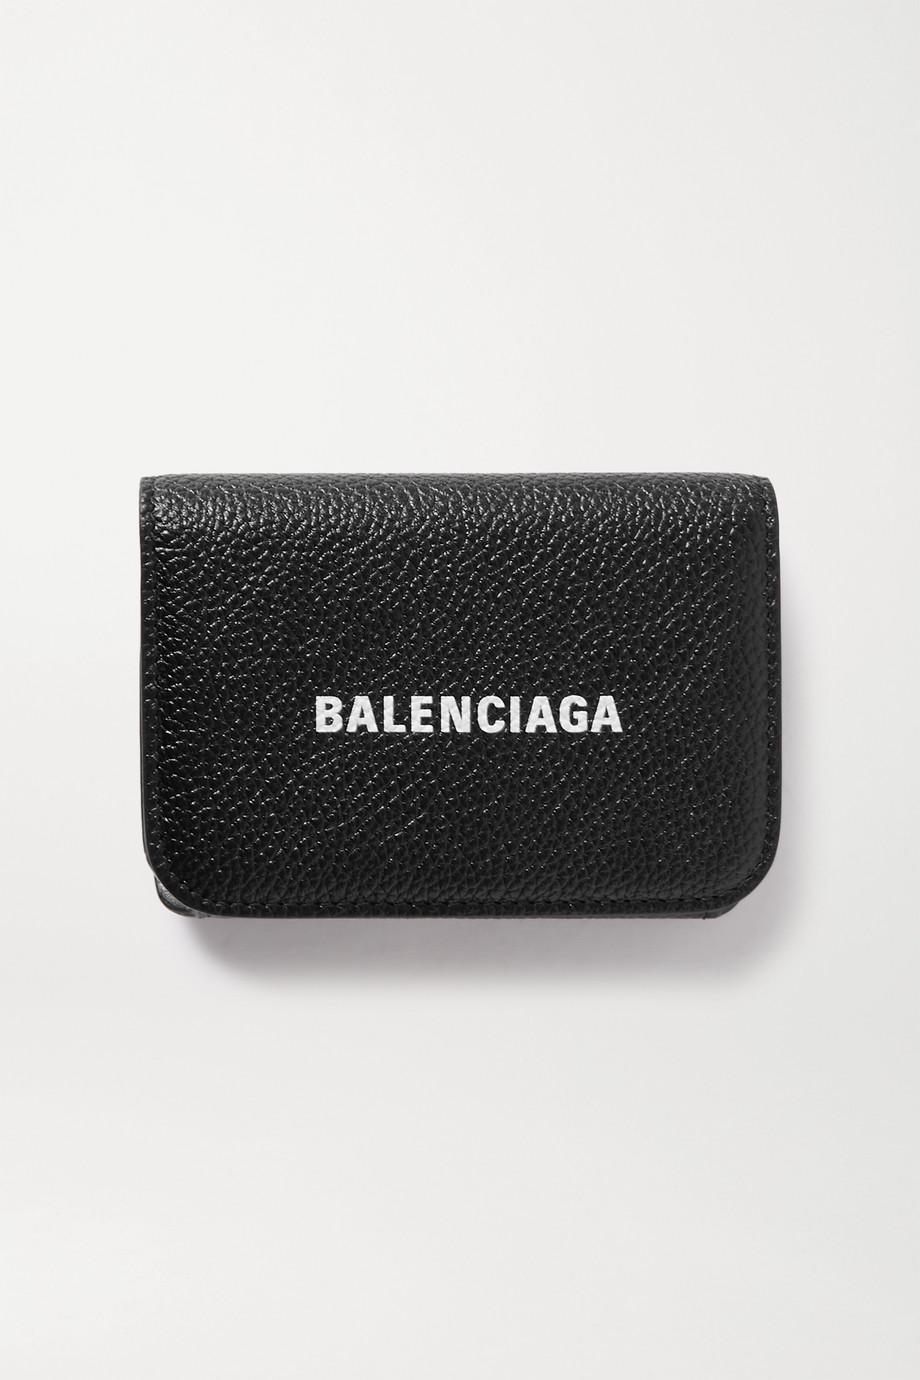 Balenciaga Porte-monnaie en cuir texturé imprimé Mini